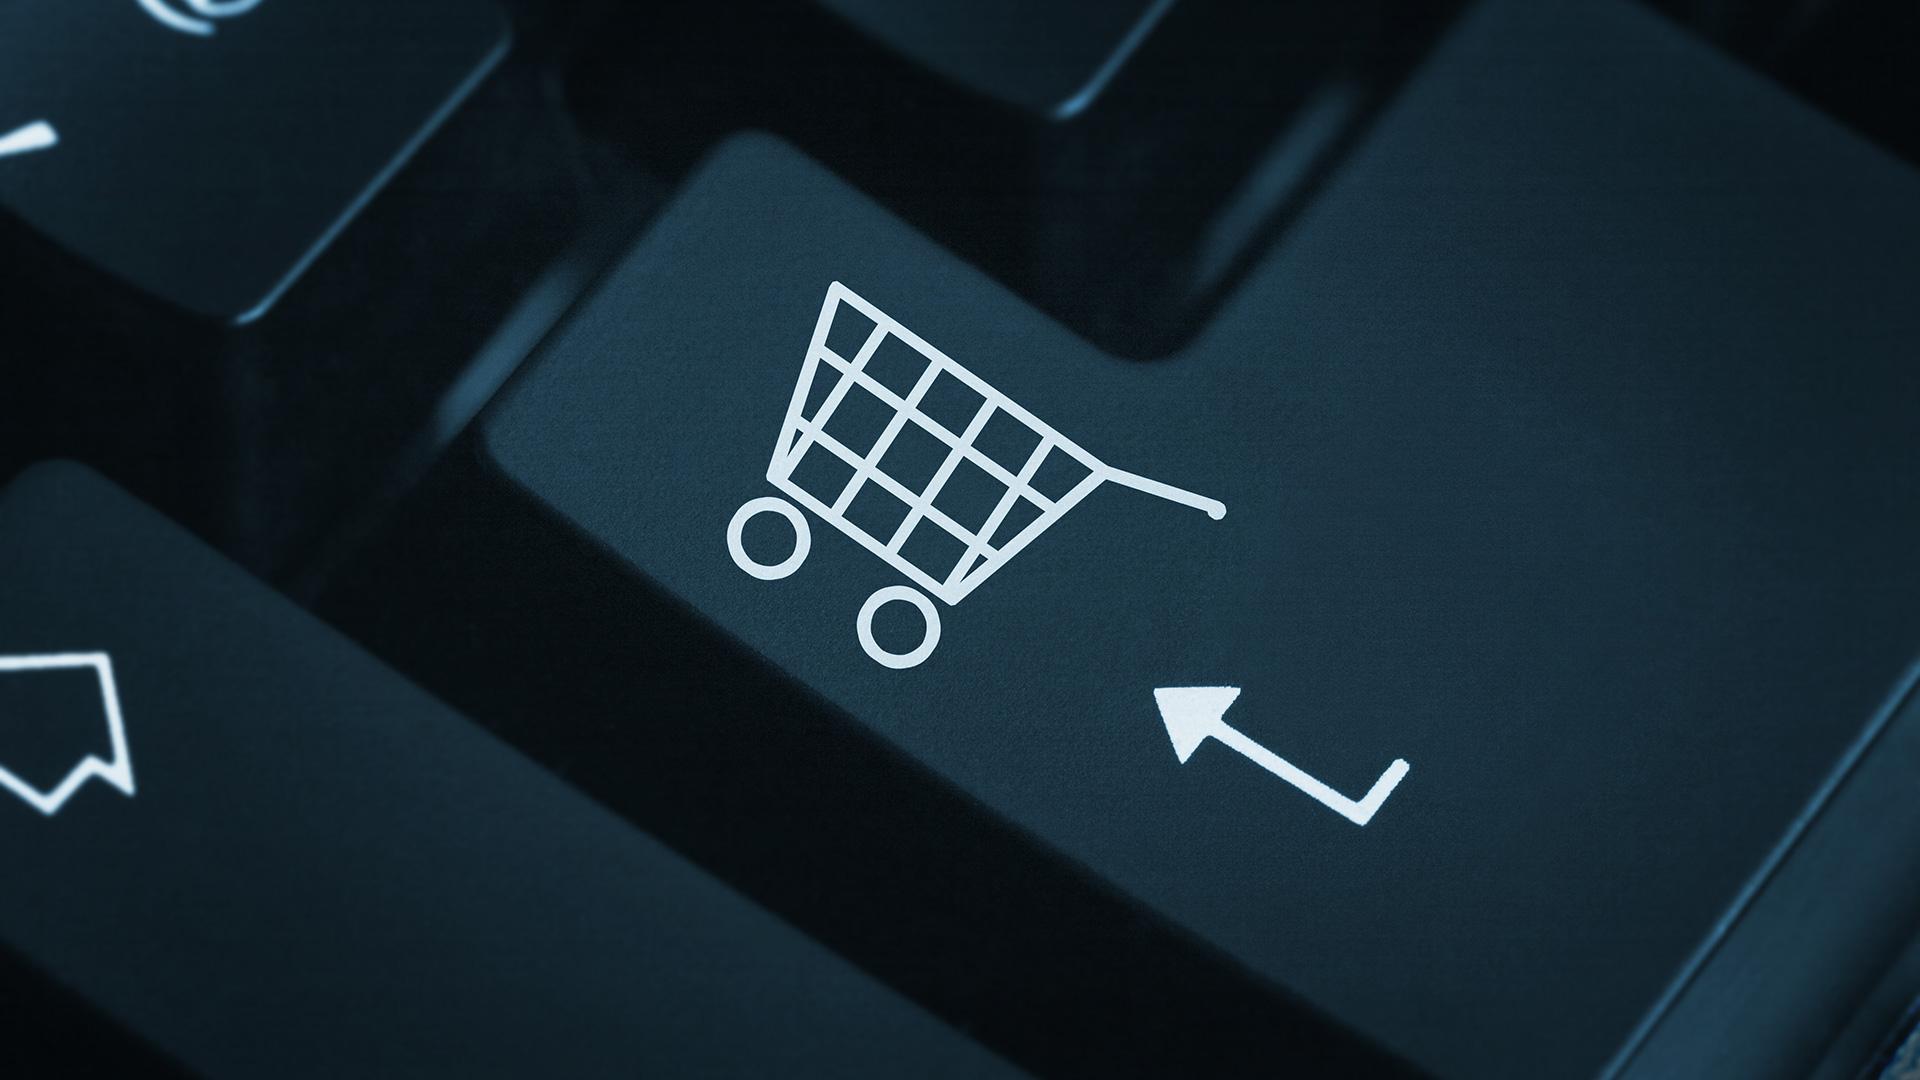 ecommerce shopping cart keyboard ss 1920